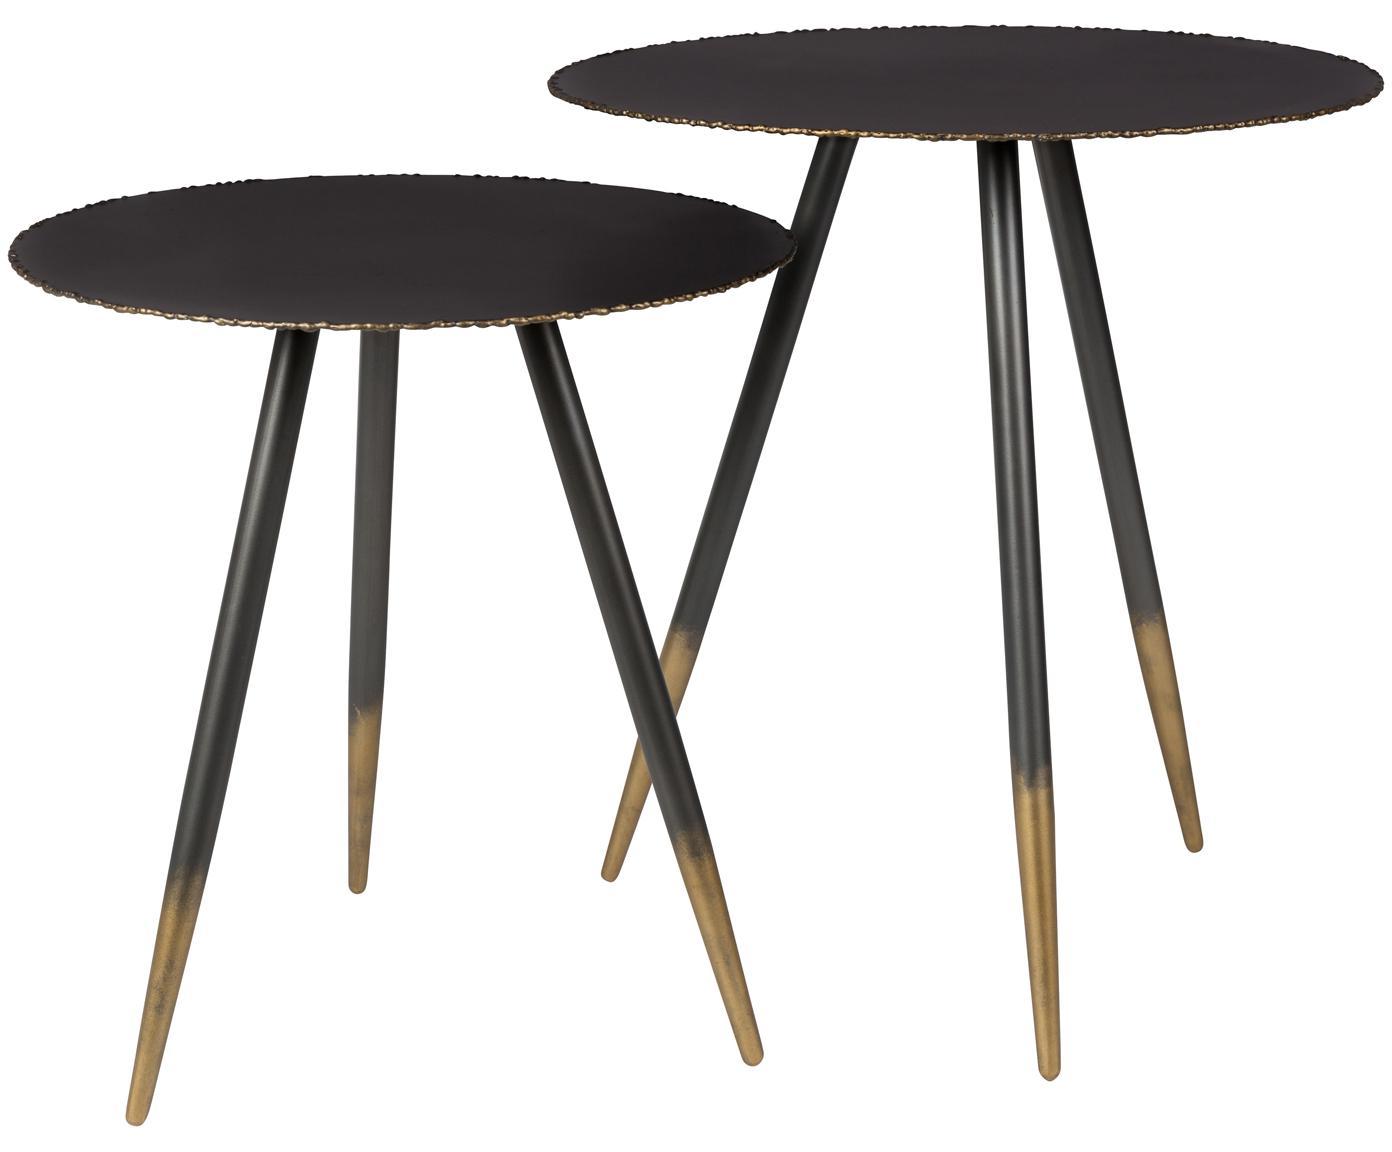 Set de mesas auxiliares Stalwart, 2uds., Negro, dorado, Tamaños diferentes